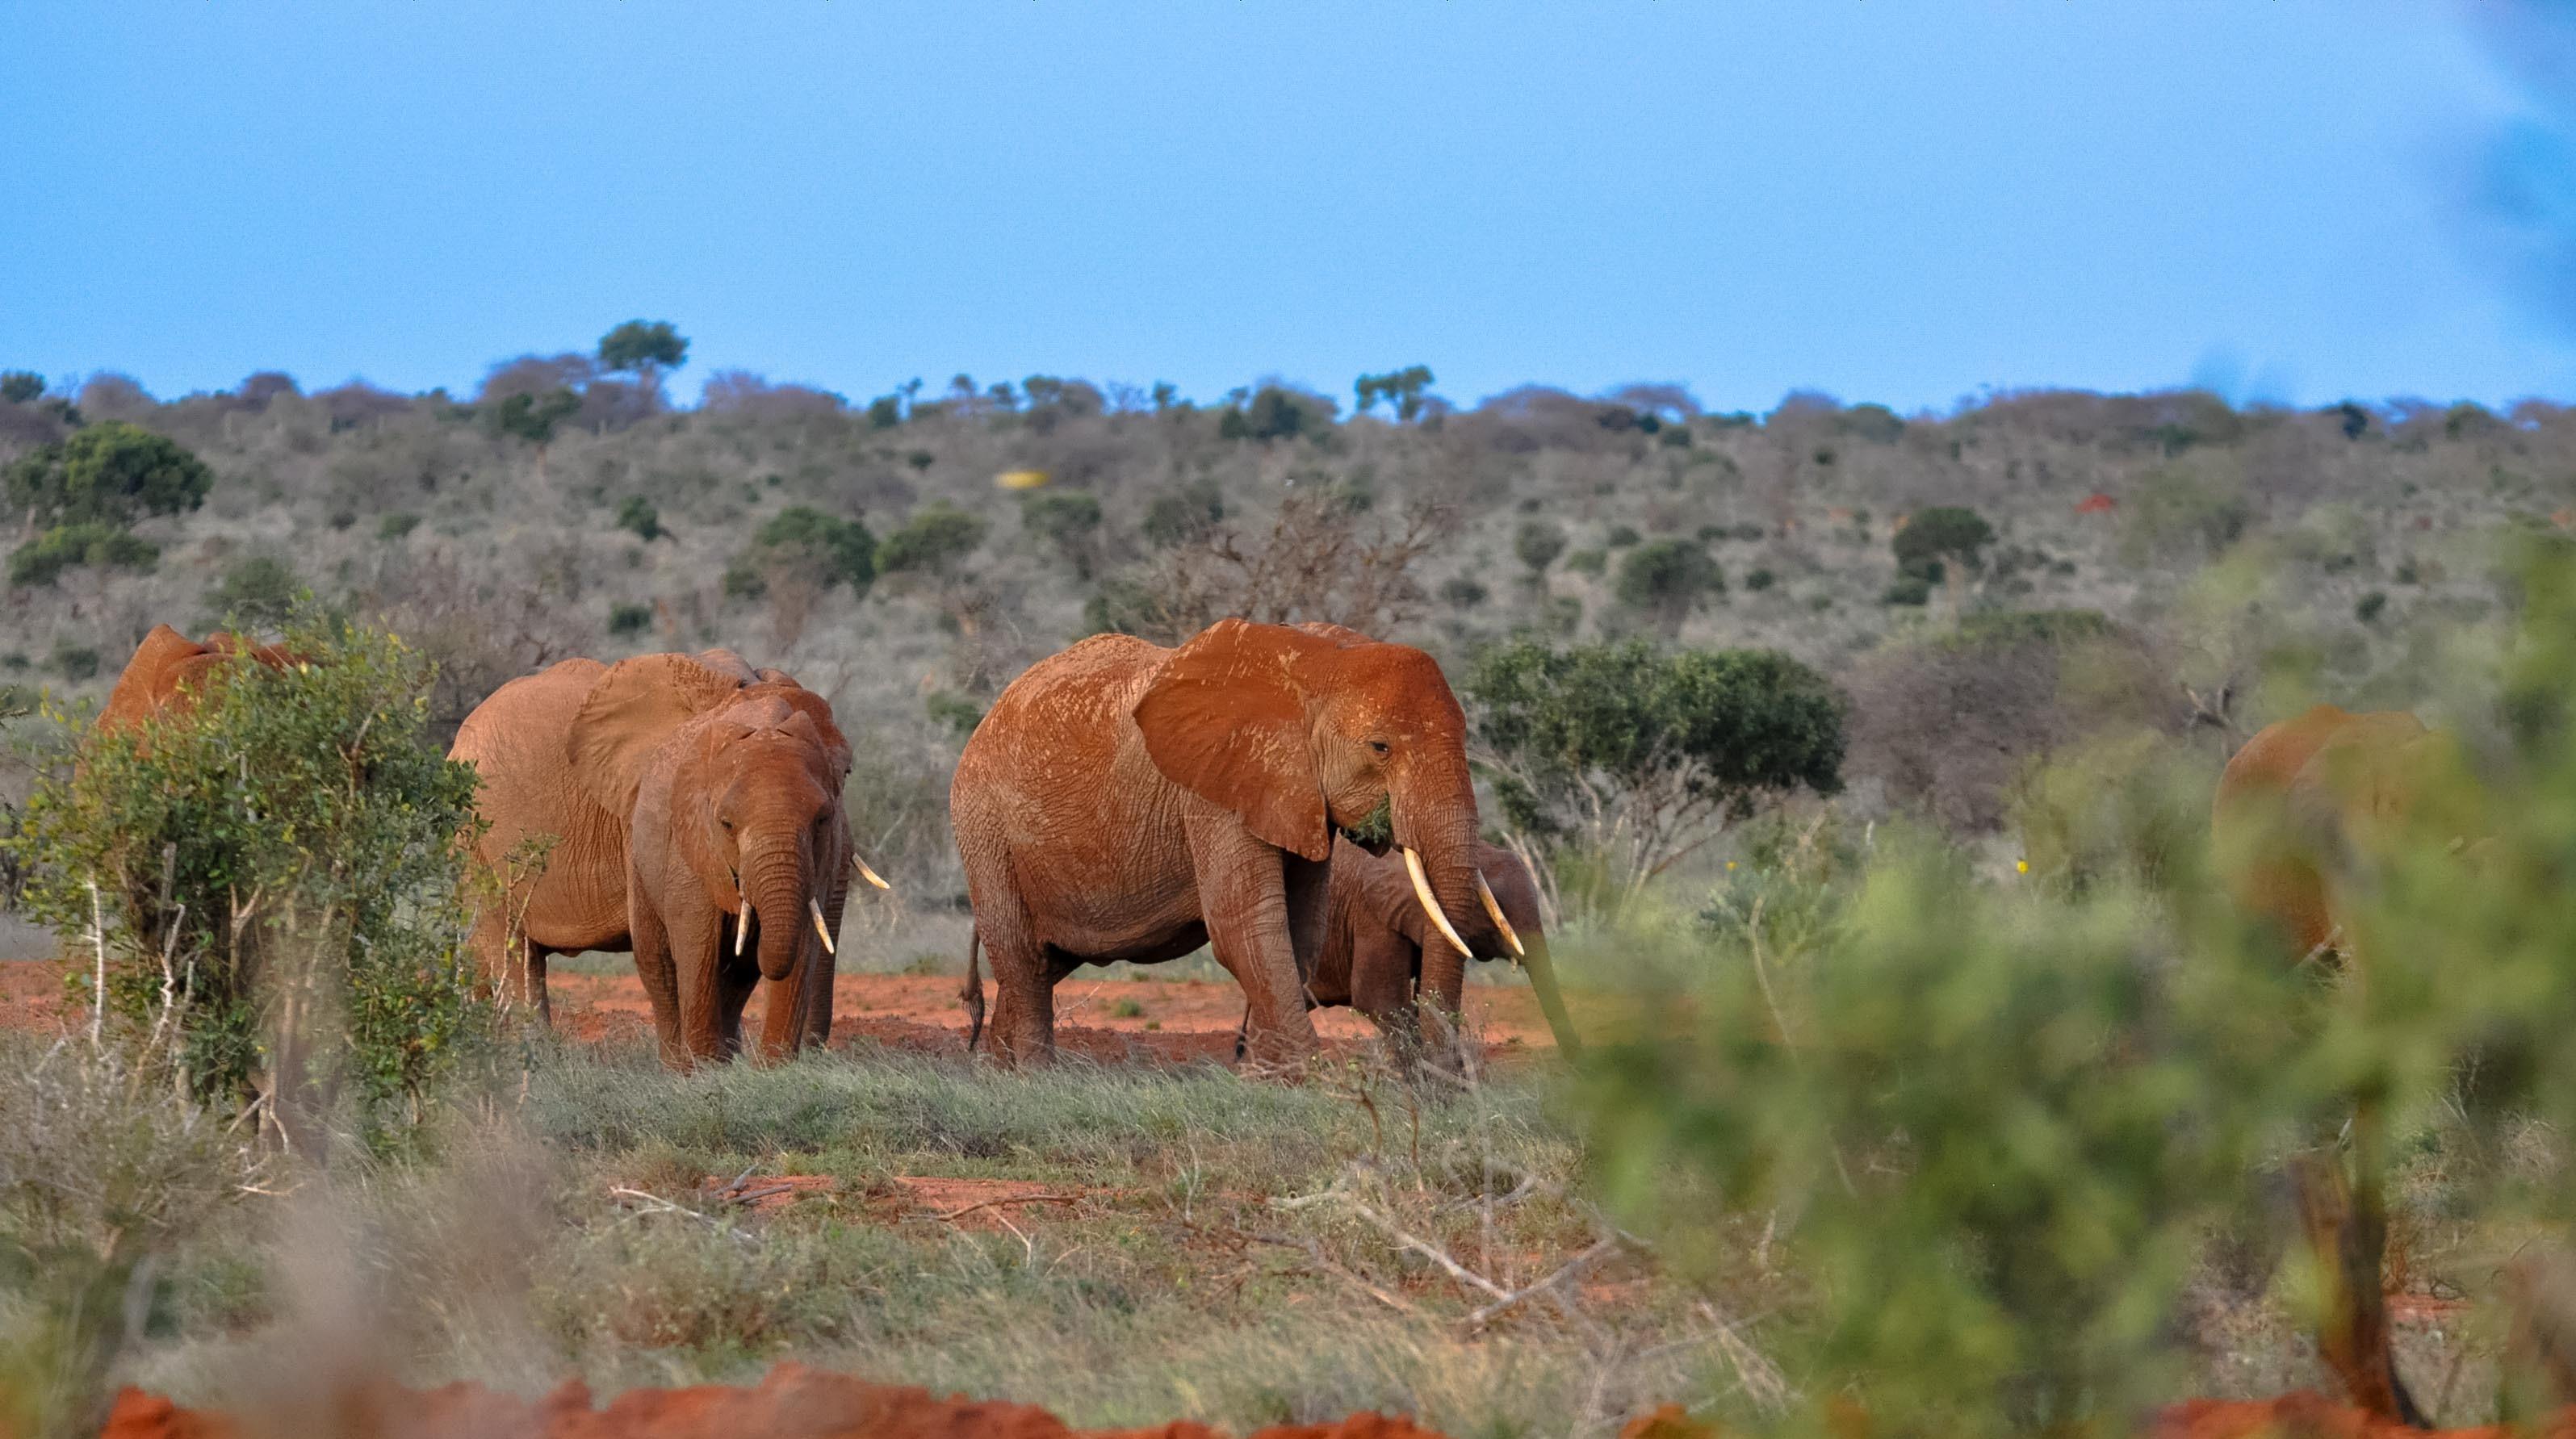 4 Day Wildlife Adventure to Tsavo East Tsavo West Amboseli National Park   Kenya wildlife Safari   Kenya adventure tours   Best Kenya Safari